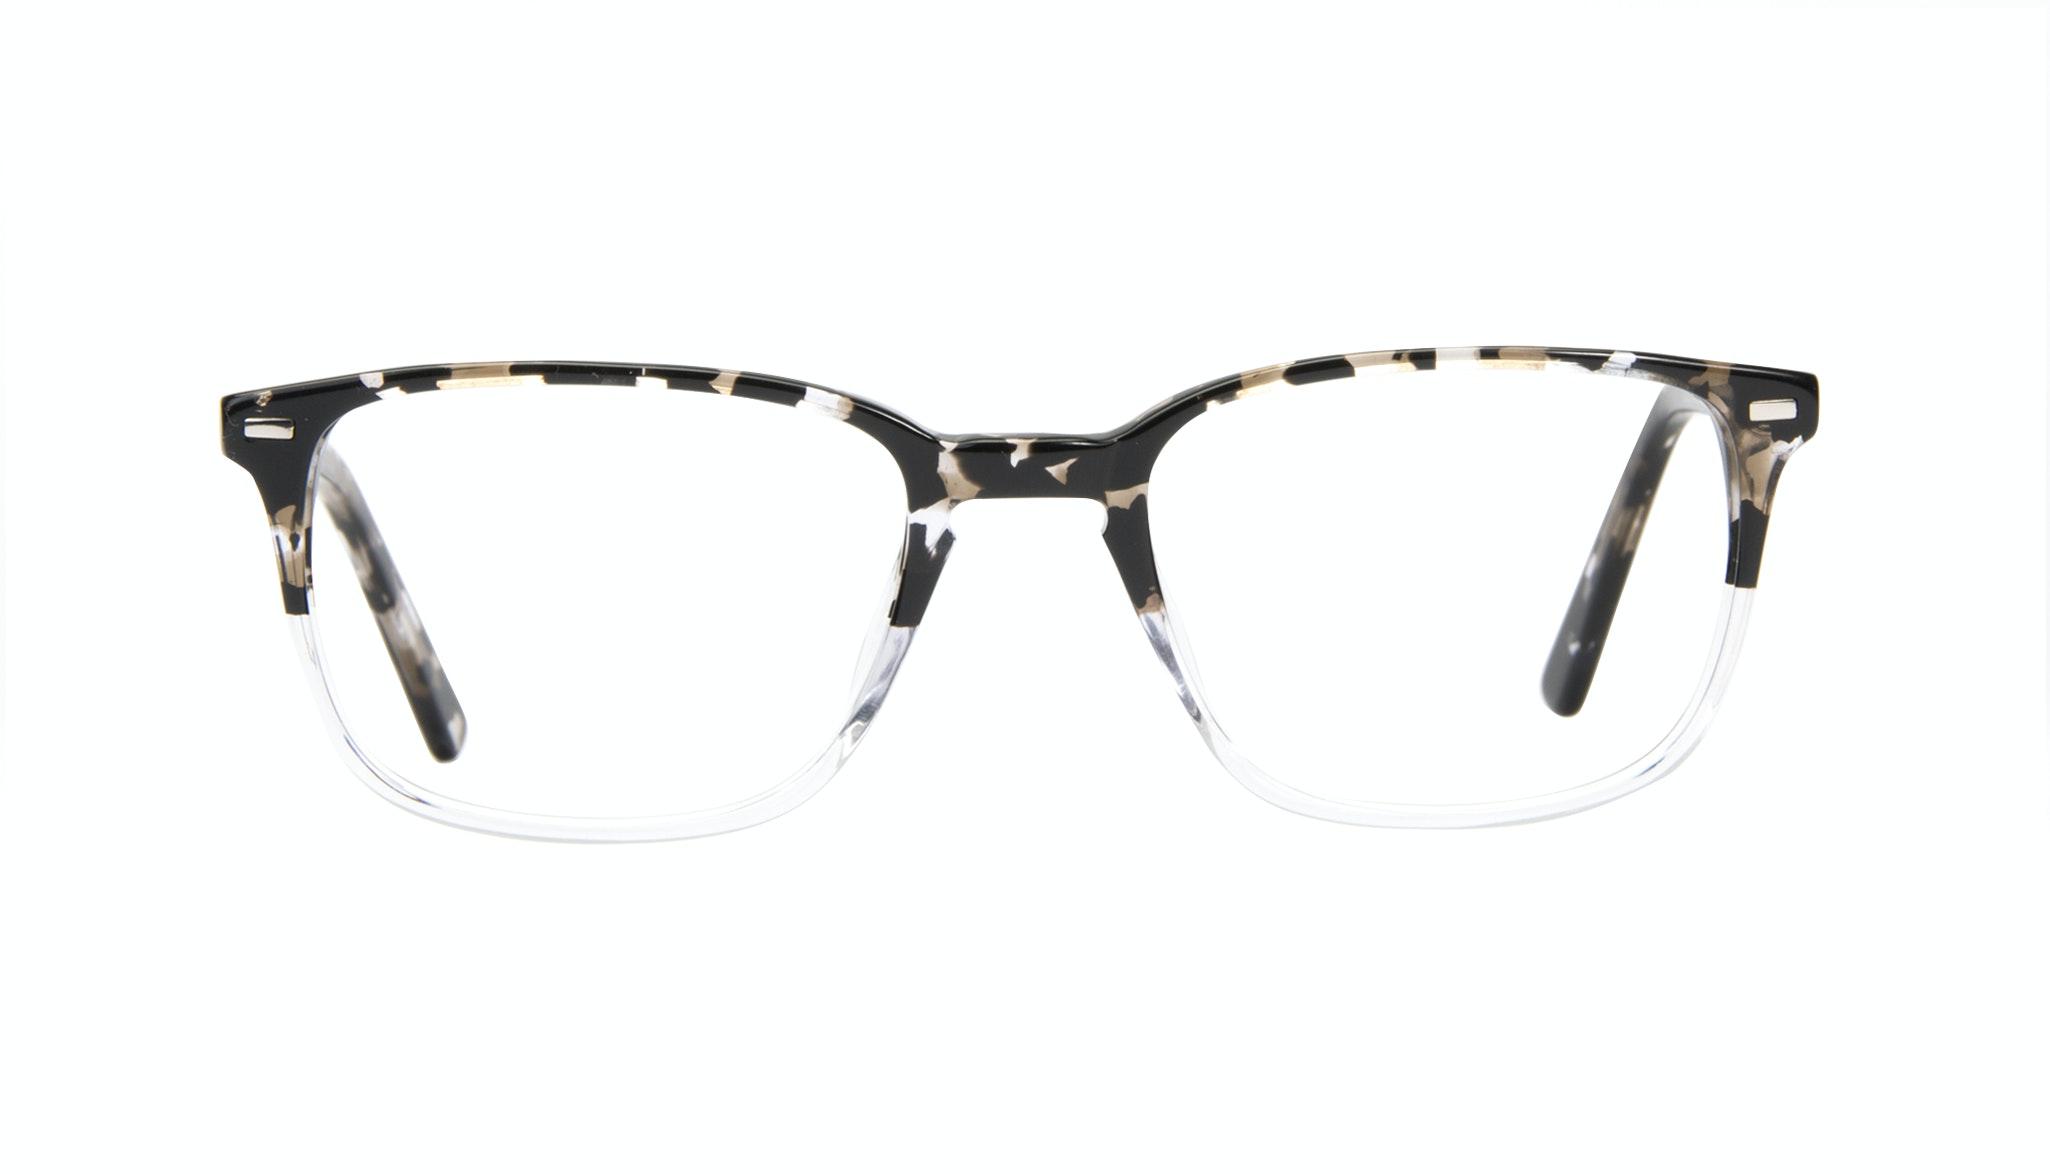 Affordable Fashion Glasses Rectangle Eyeglasses Men Sharp Clear Stone